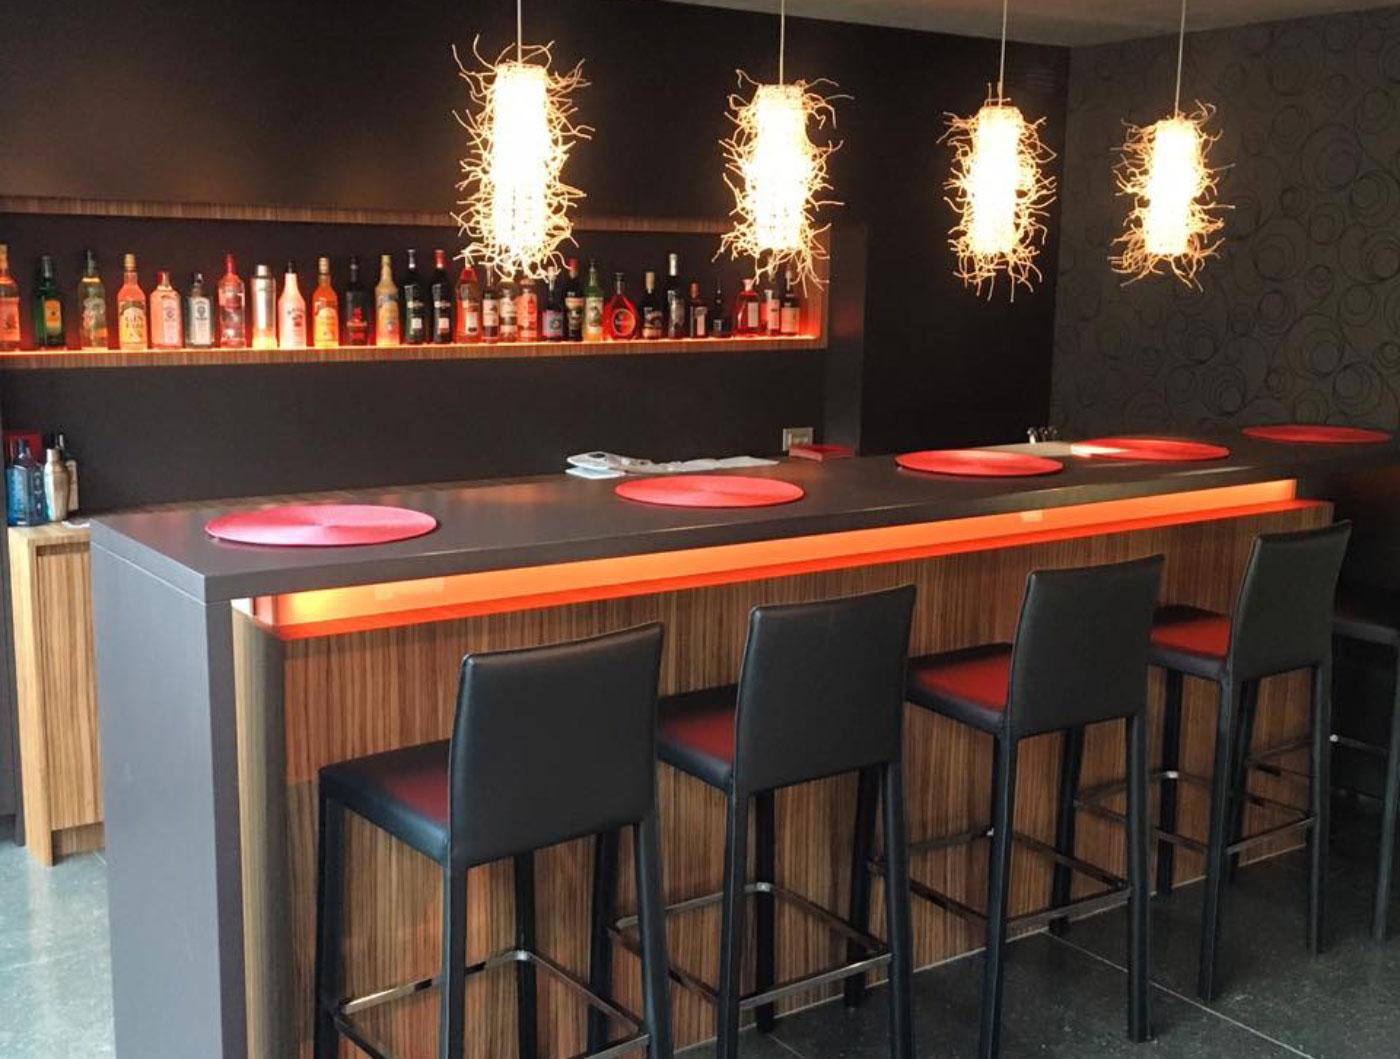 Keuken Bar Design : Keuken bar in 2 design